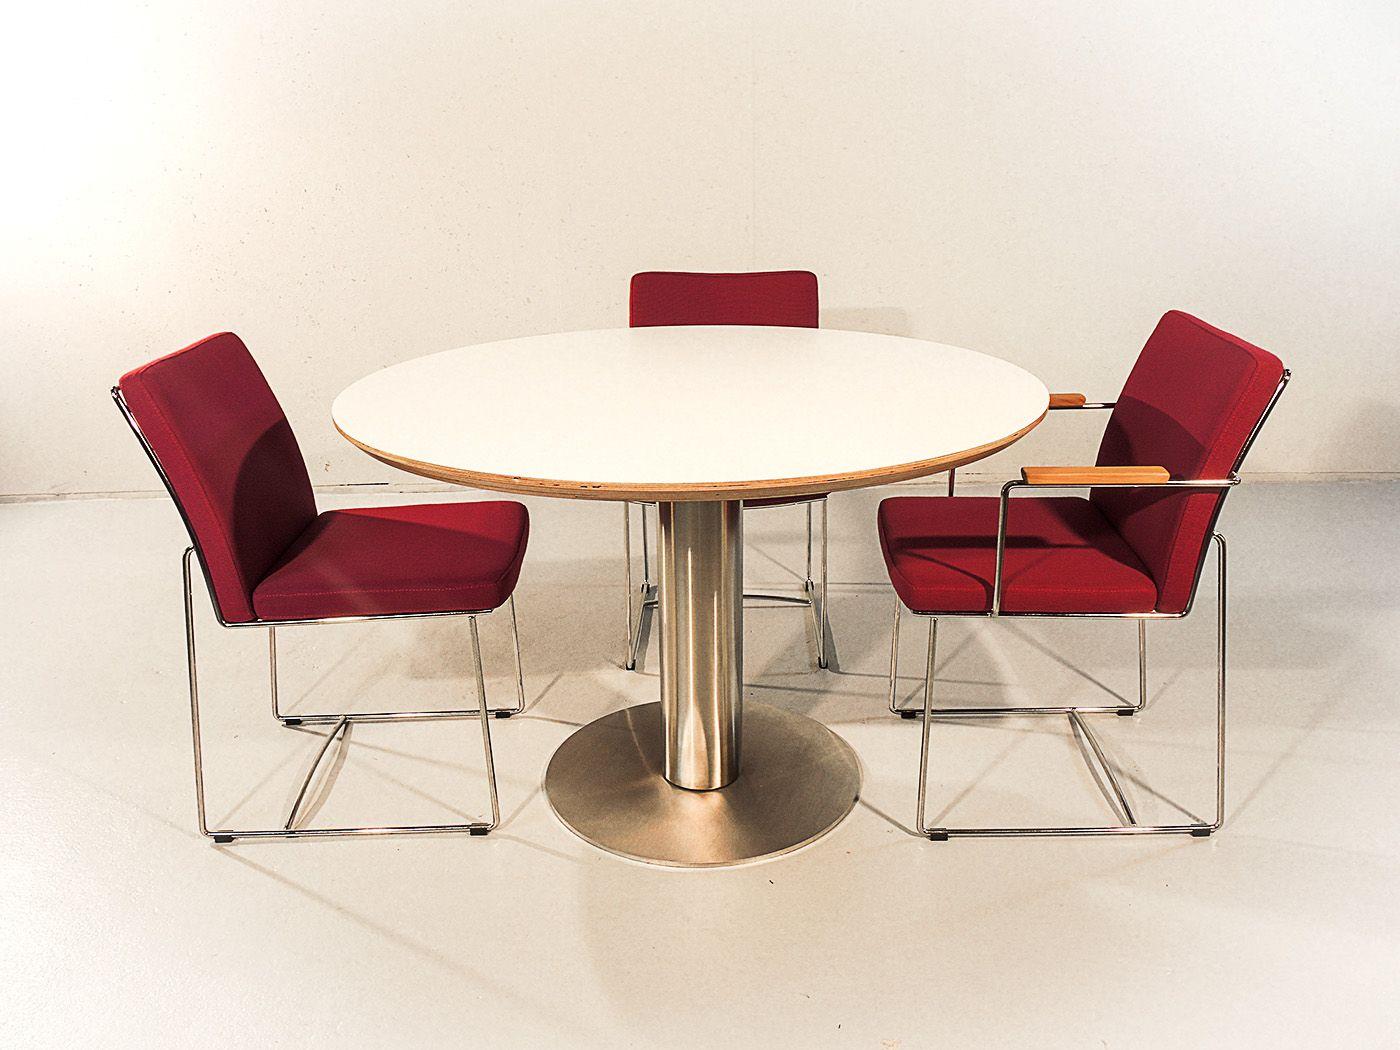 Orvieto ronde tafel met wit blad tafel modern